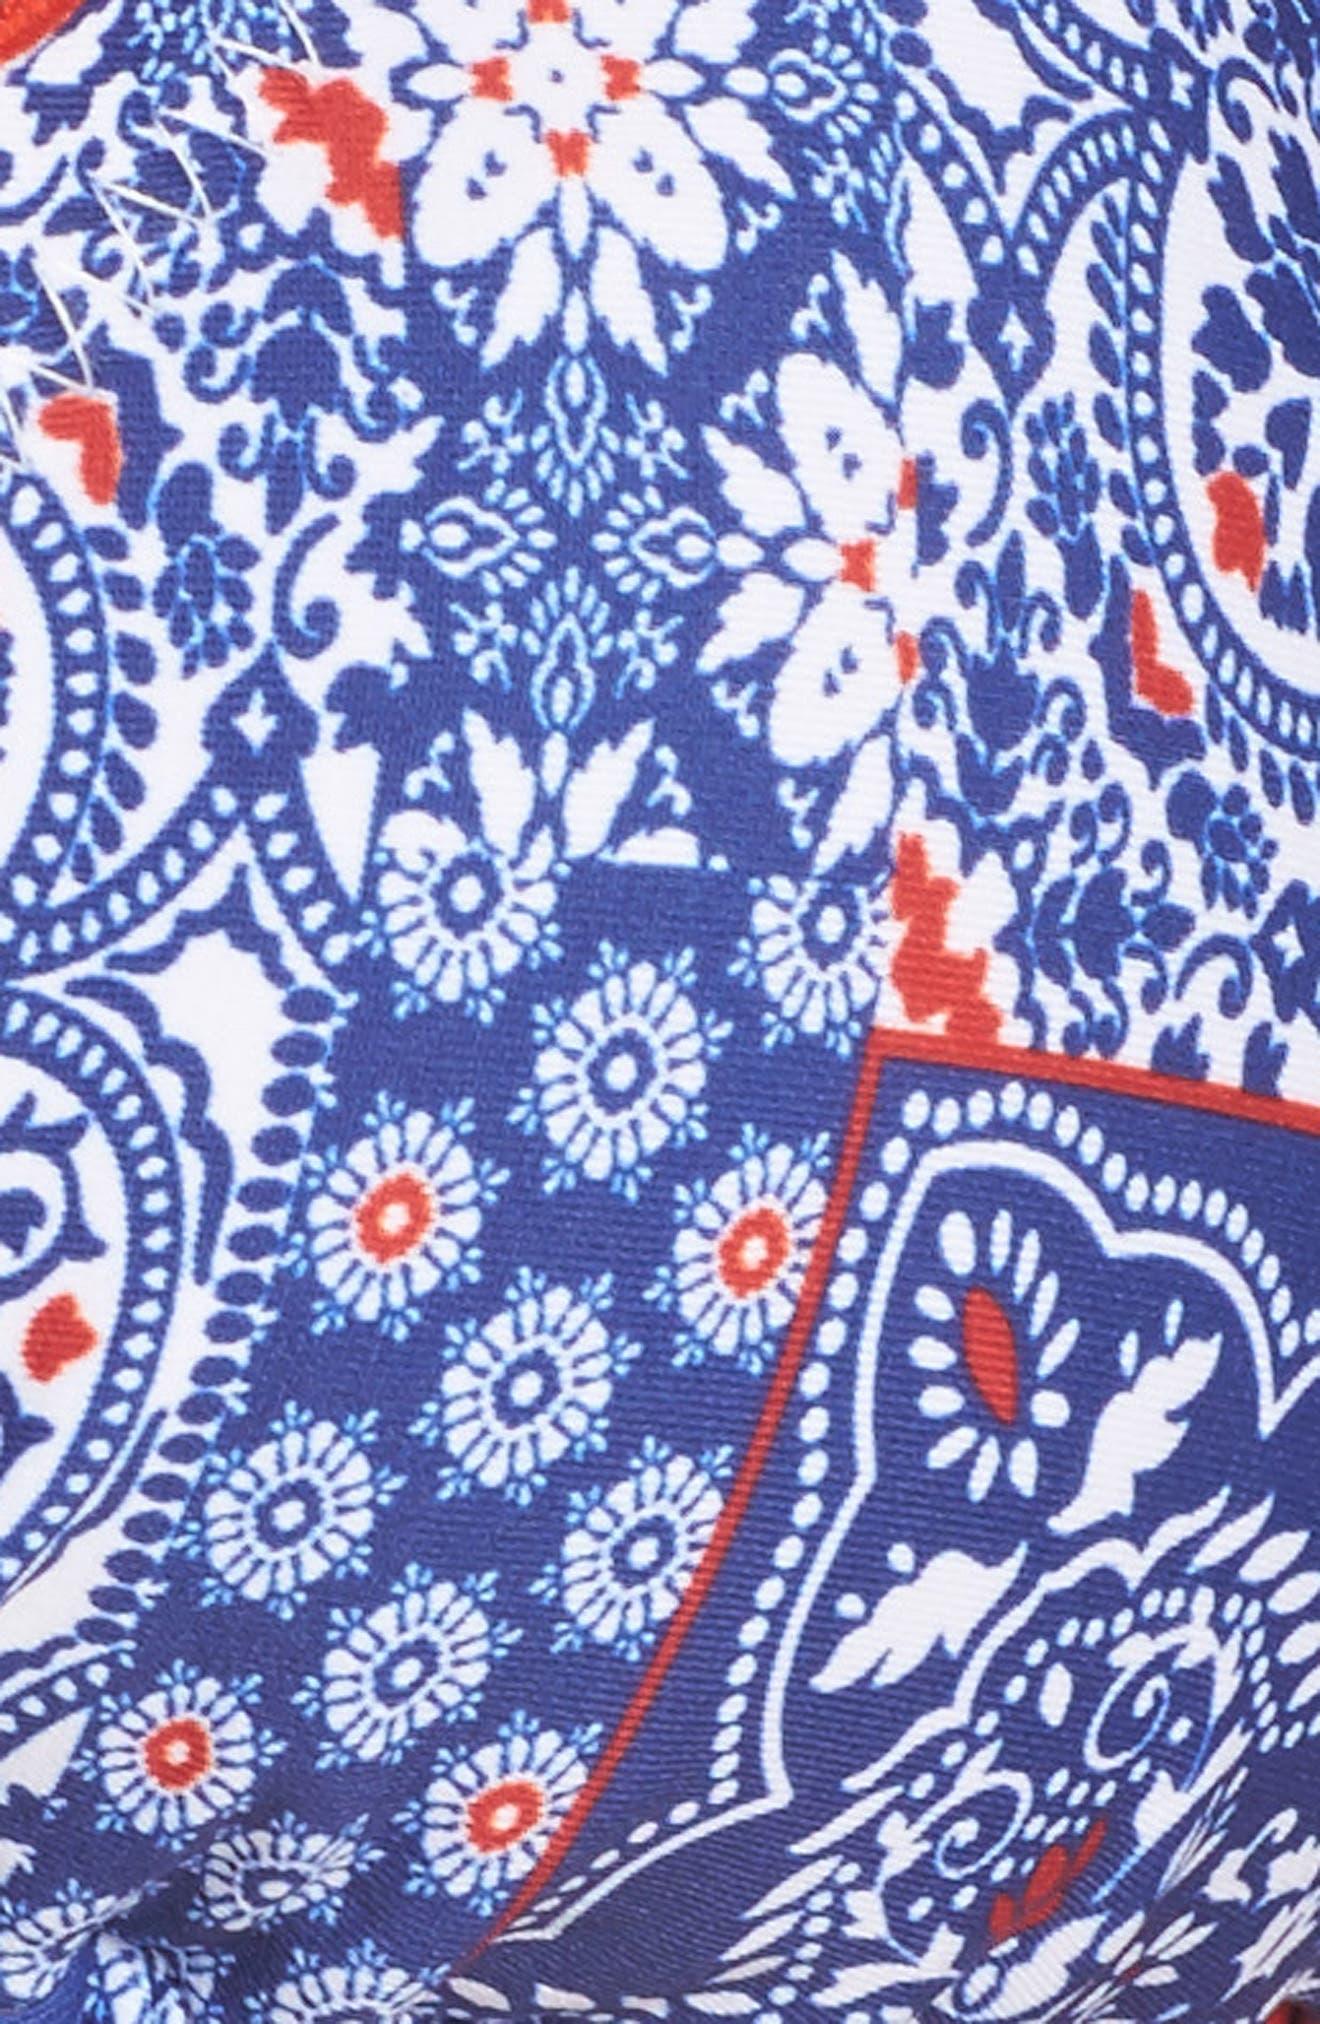 Naughty Girl Bikini Top,                             Alternate thumbnail 5, color,                             Blue Multi